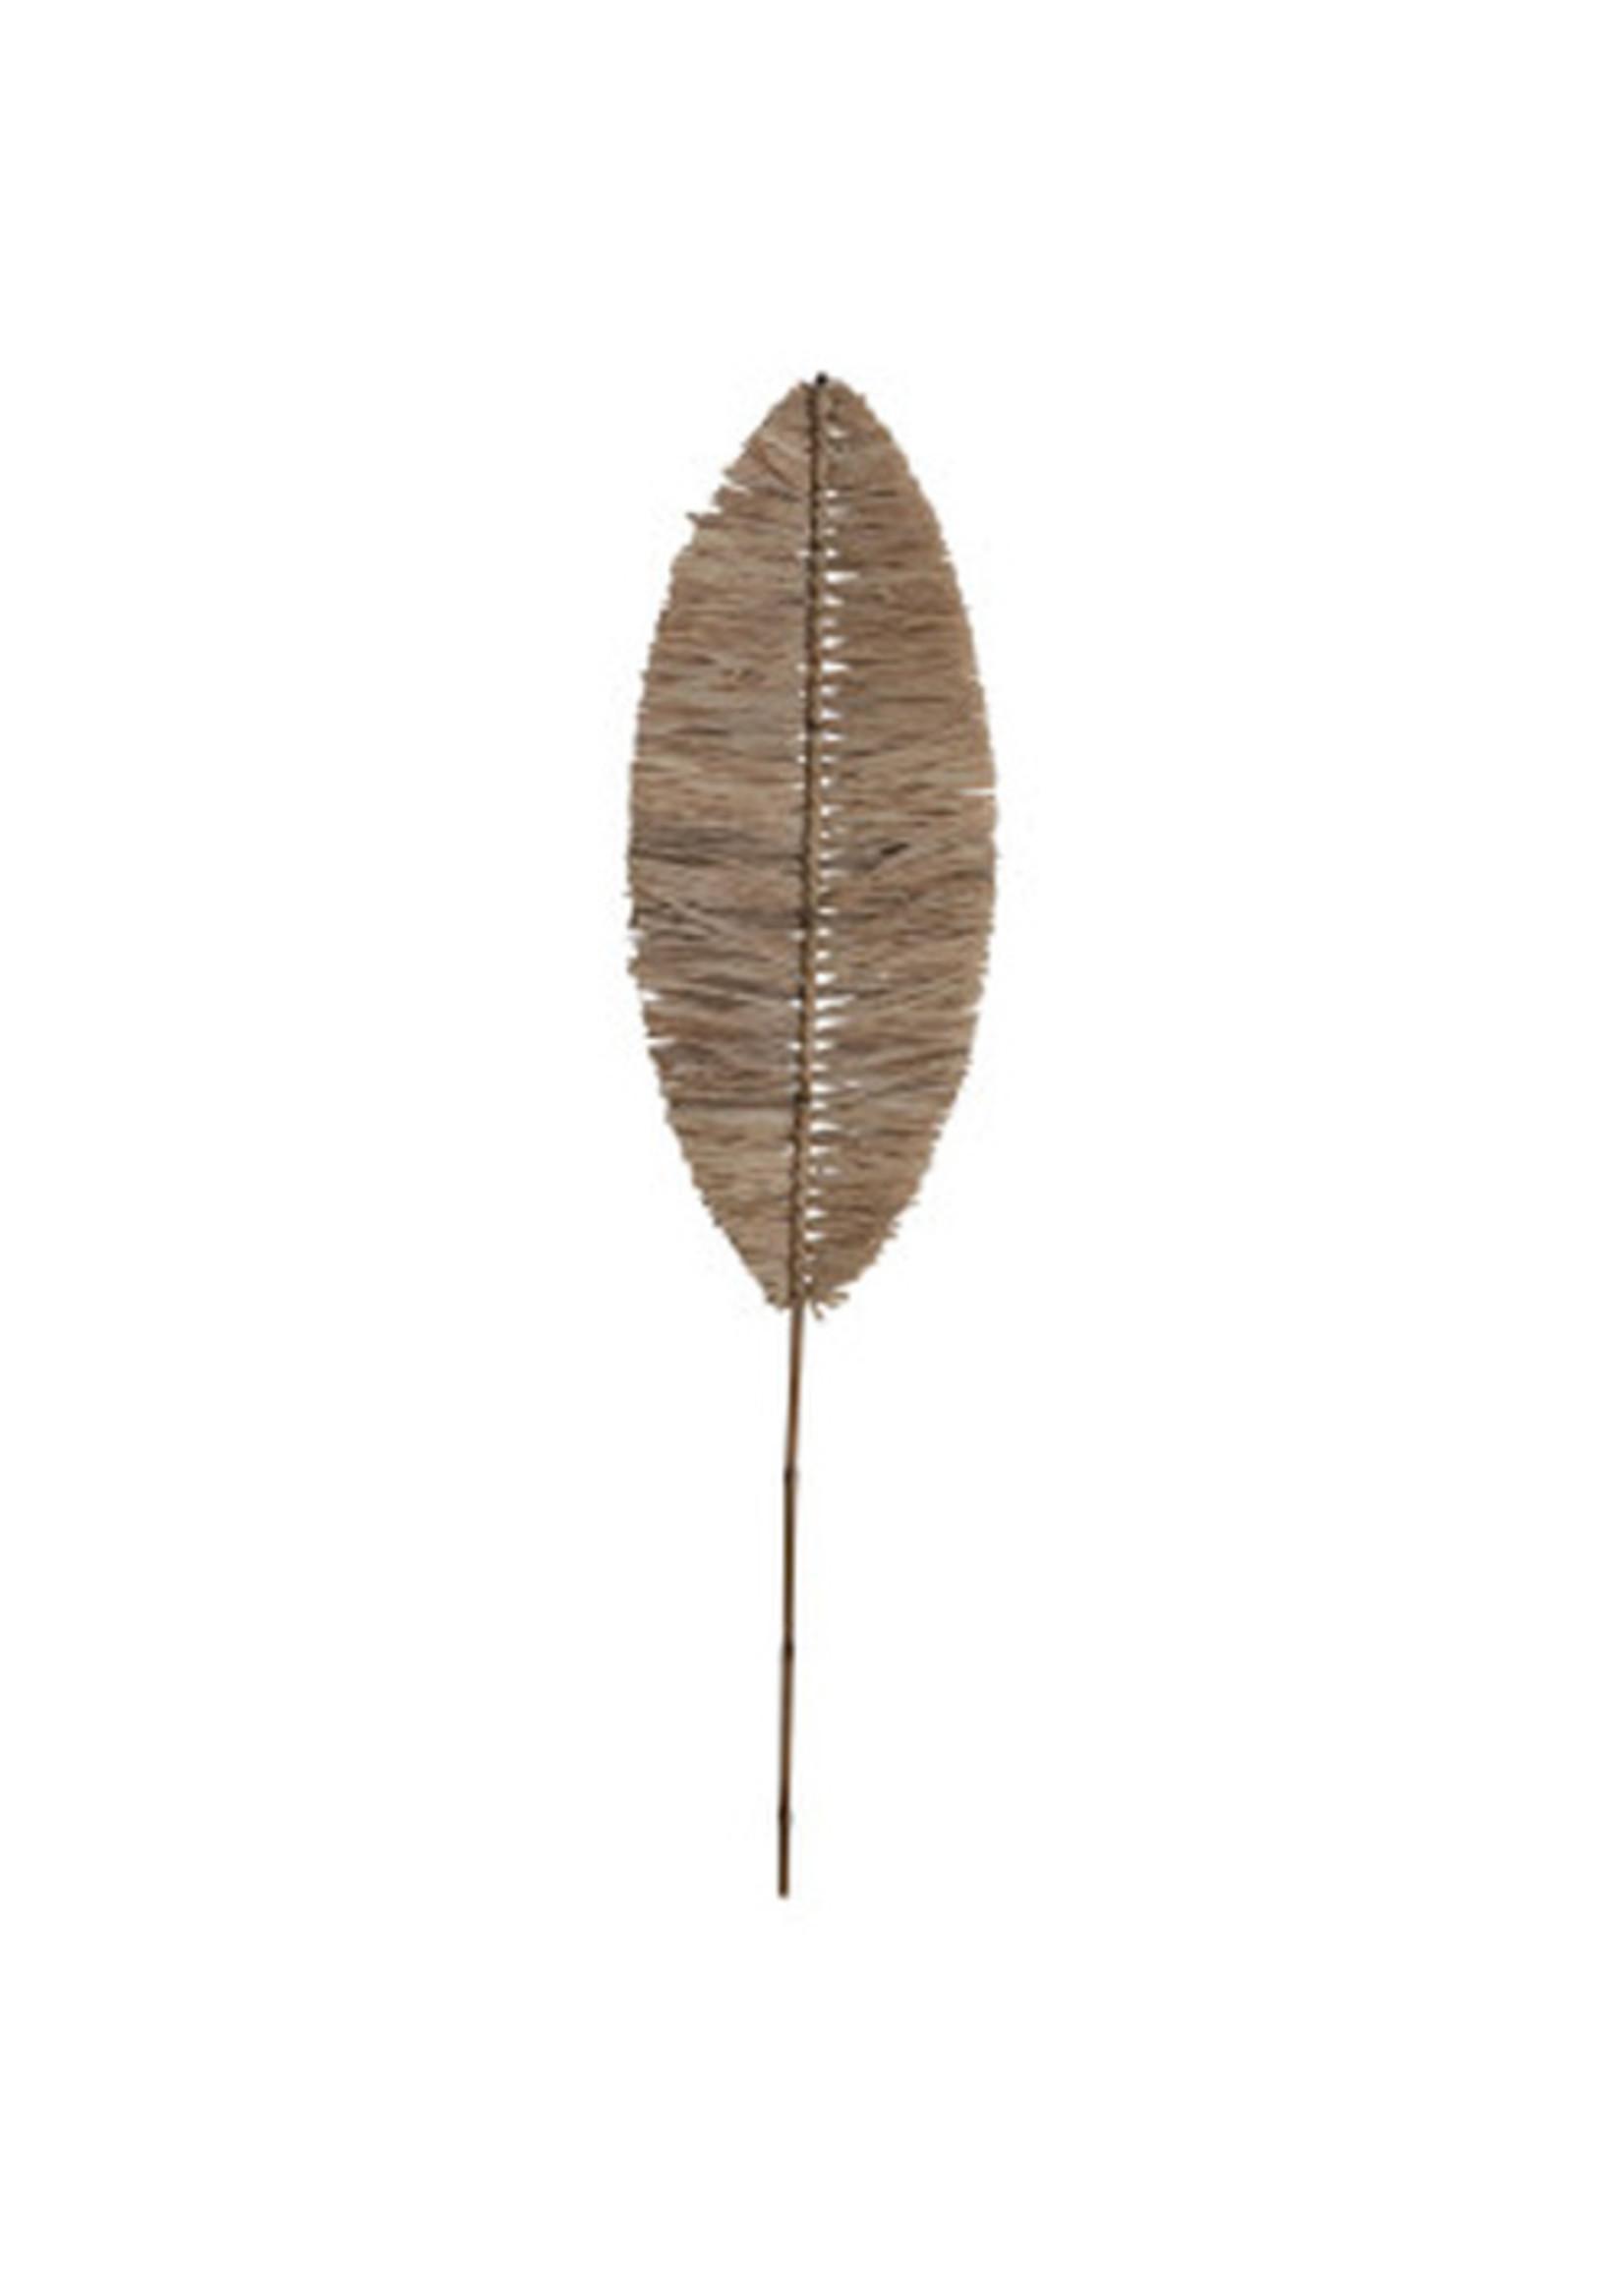 Handmade Natural Raffia Banana Leaf Shape